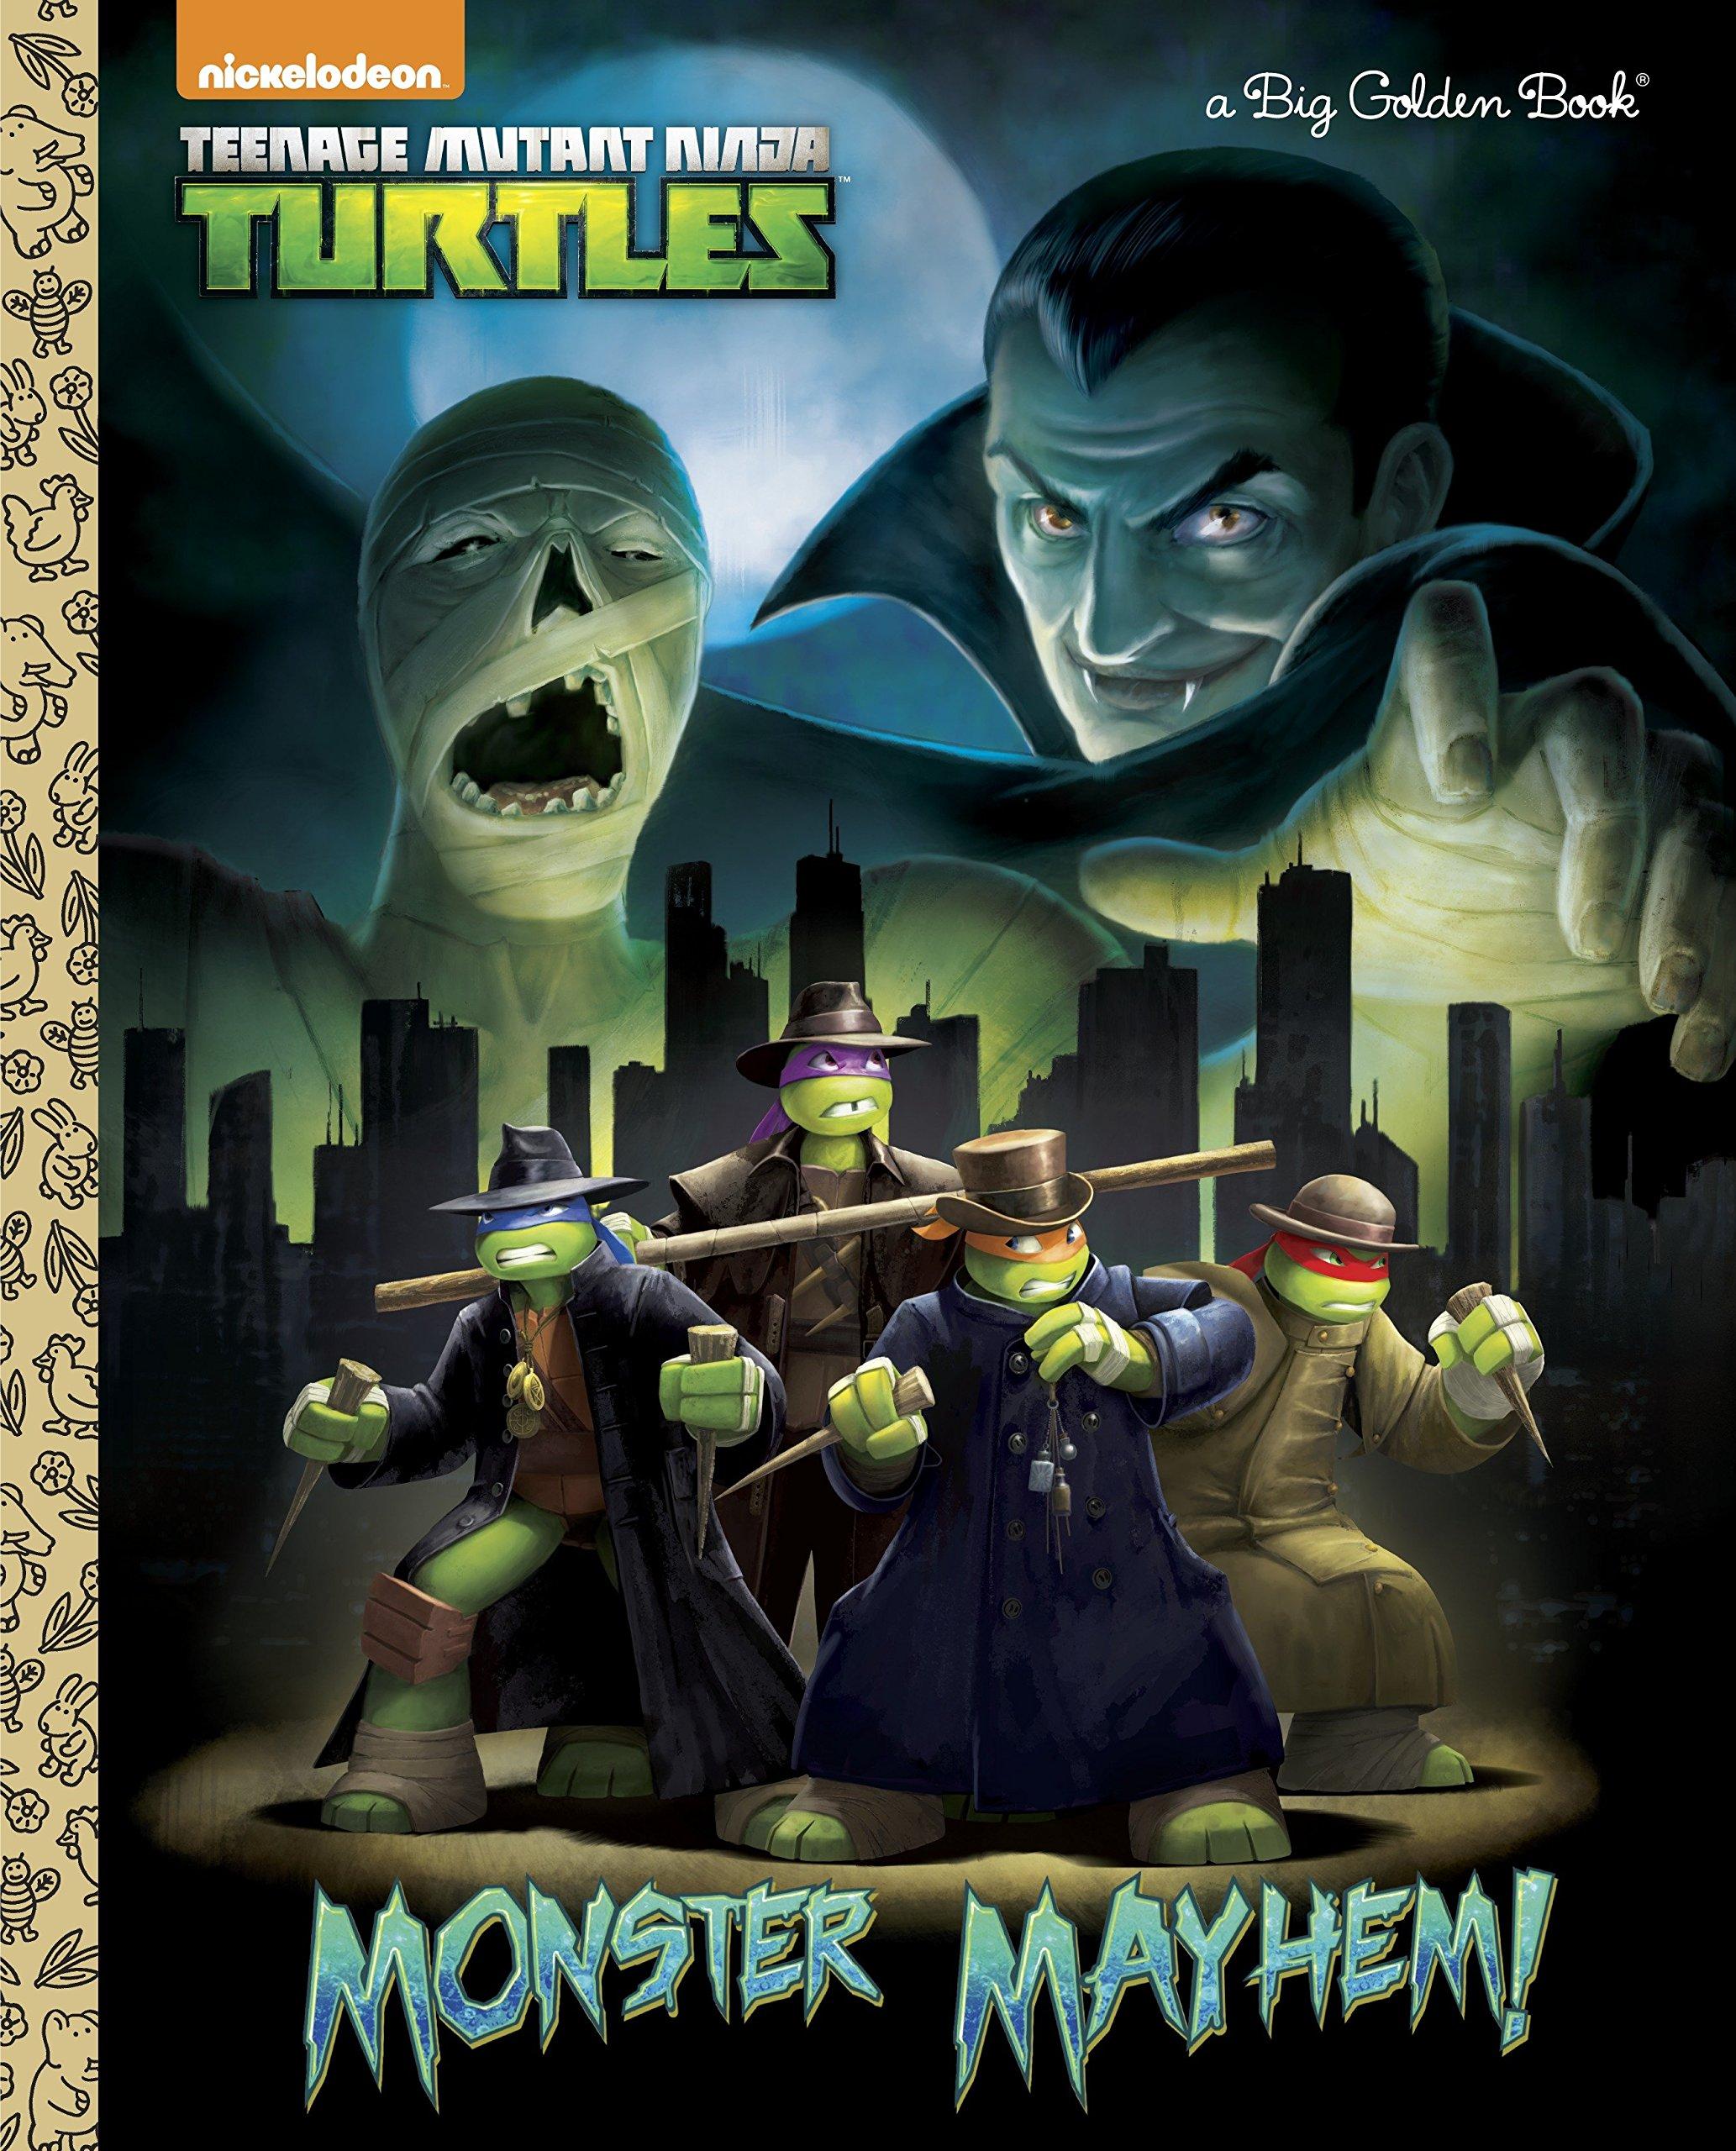 Monster Mayhem! (Teenage Mutant Ninja Turtles) (Big Golden ...